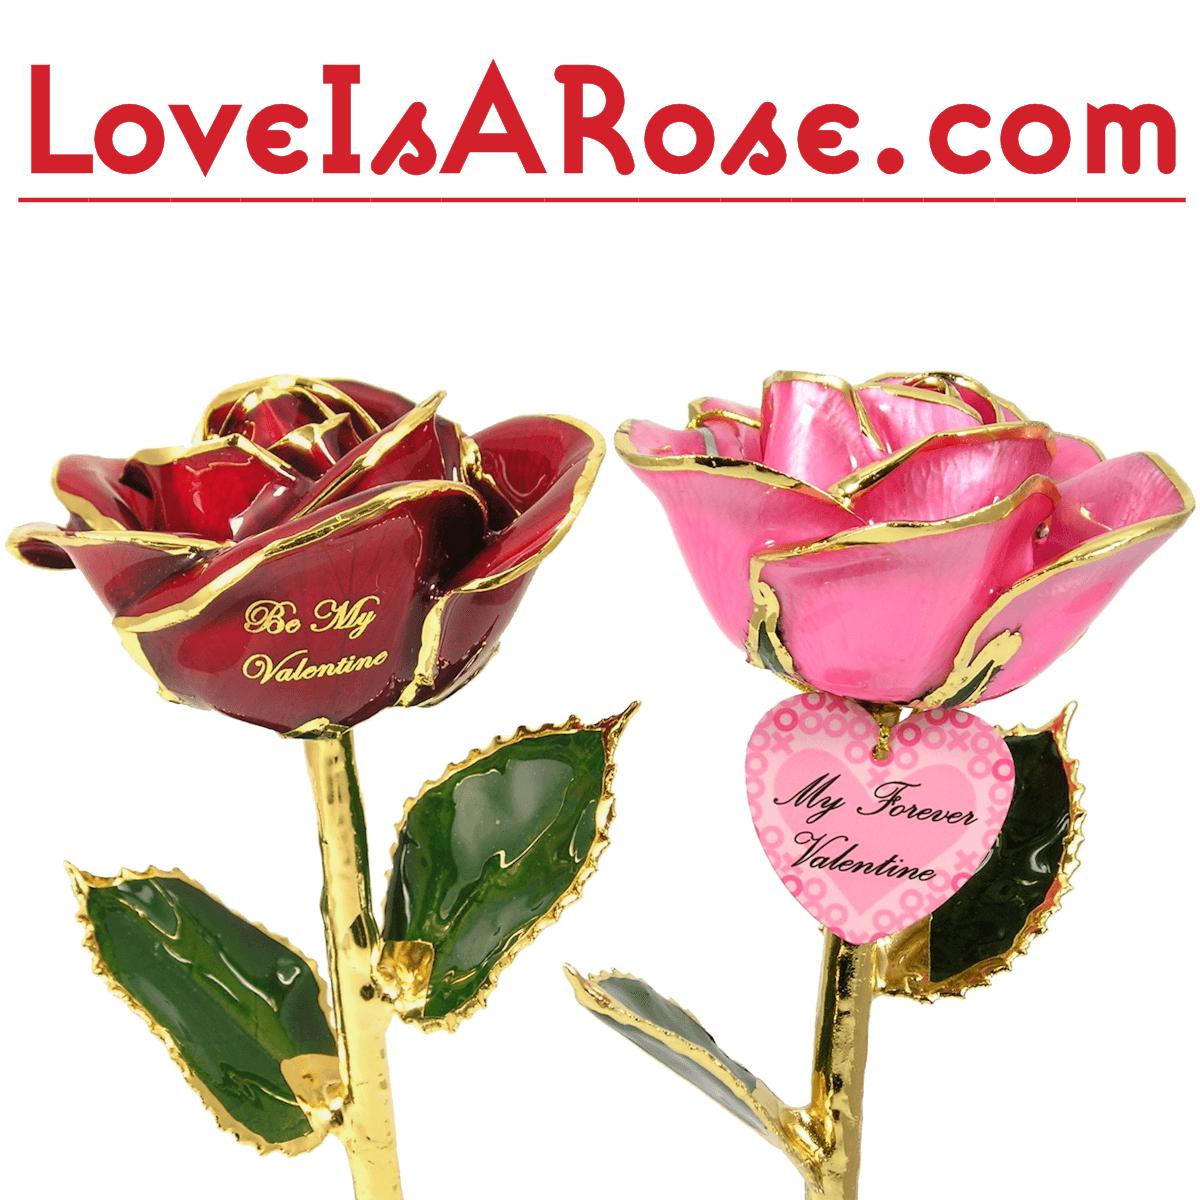 Glass Crystal Red Rose Gold Stem Romantic Gift Idea Anniversary Birthday